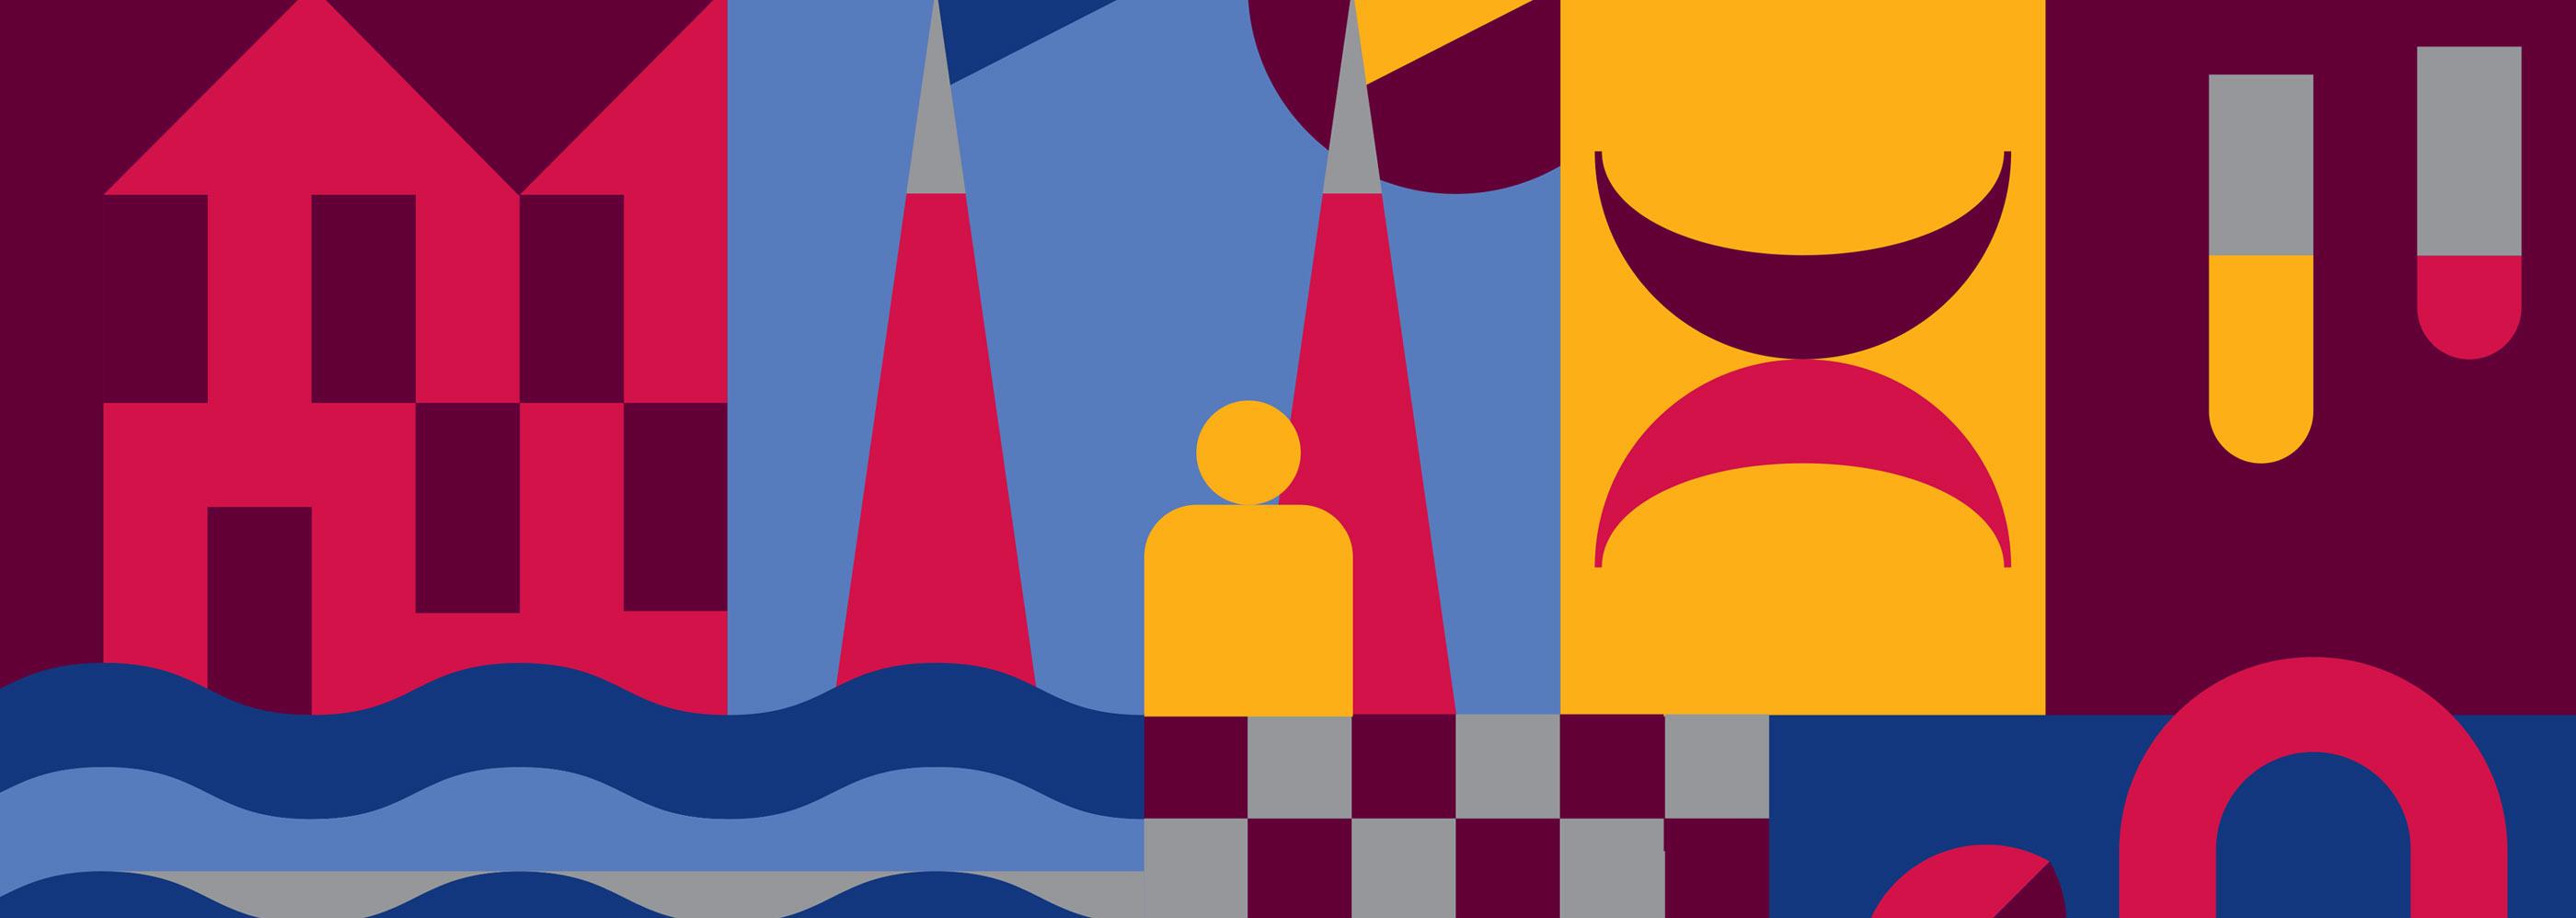 University of Limerick graphic design, colour defining and brand development